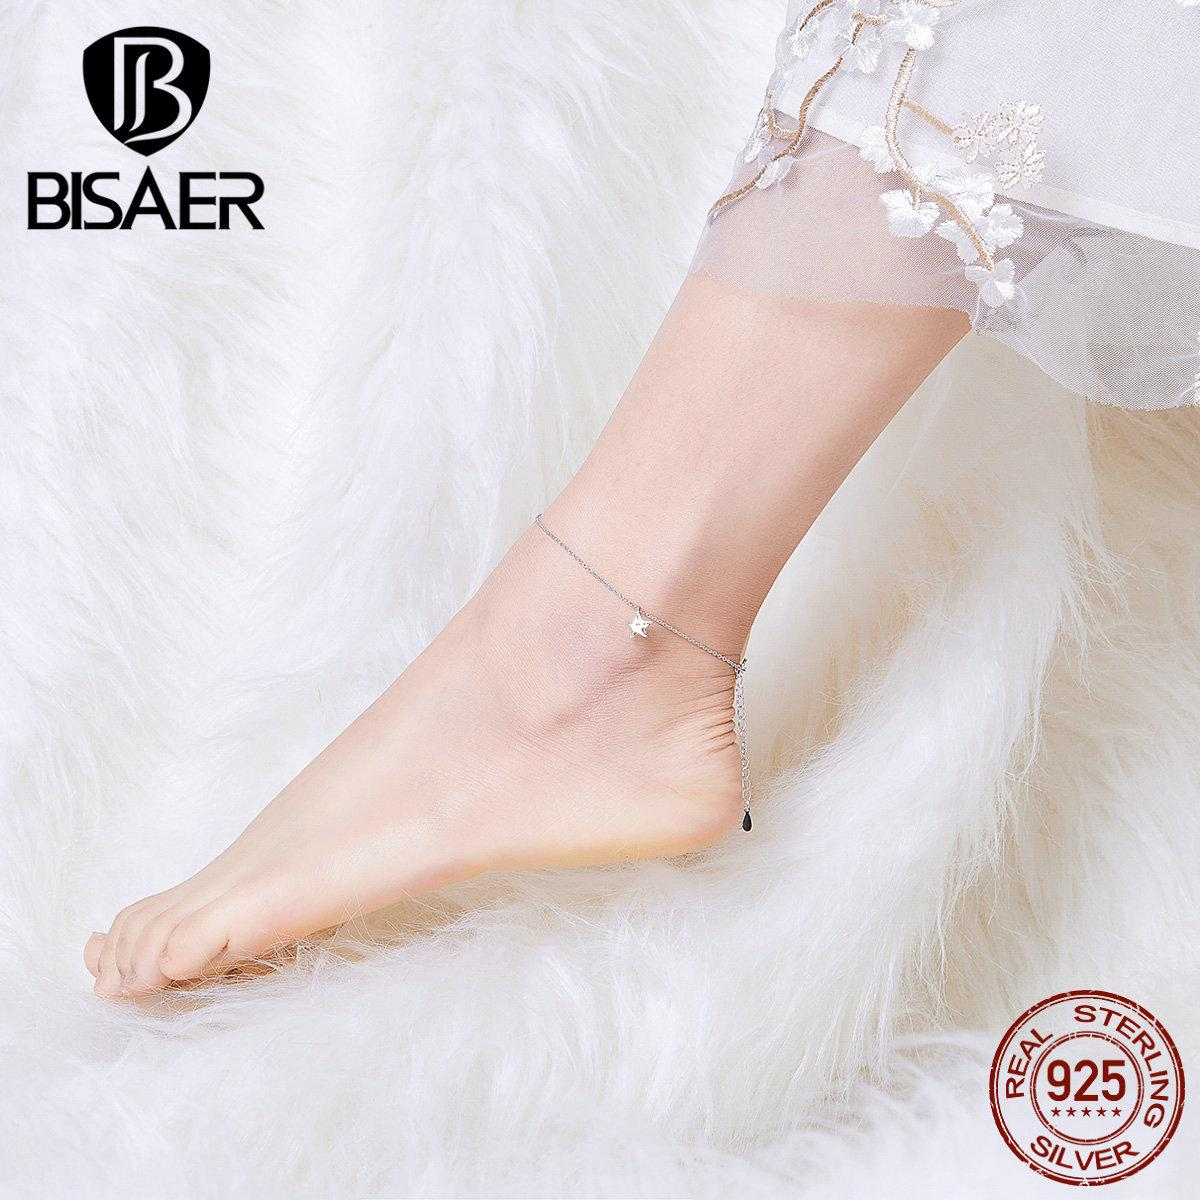 2020 Bisaer 925 Elegante Sternform Einfache Kette Frauen Fußklets Sterling Silber Schmuck ECT009